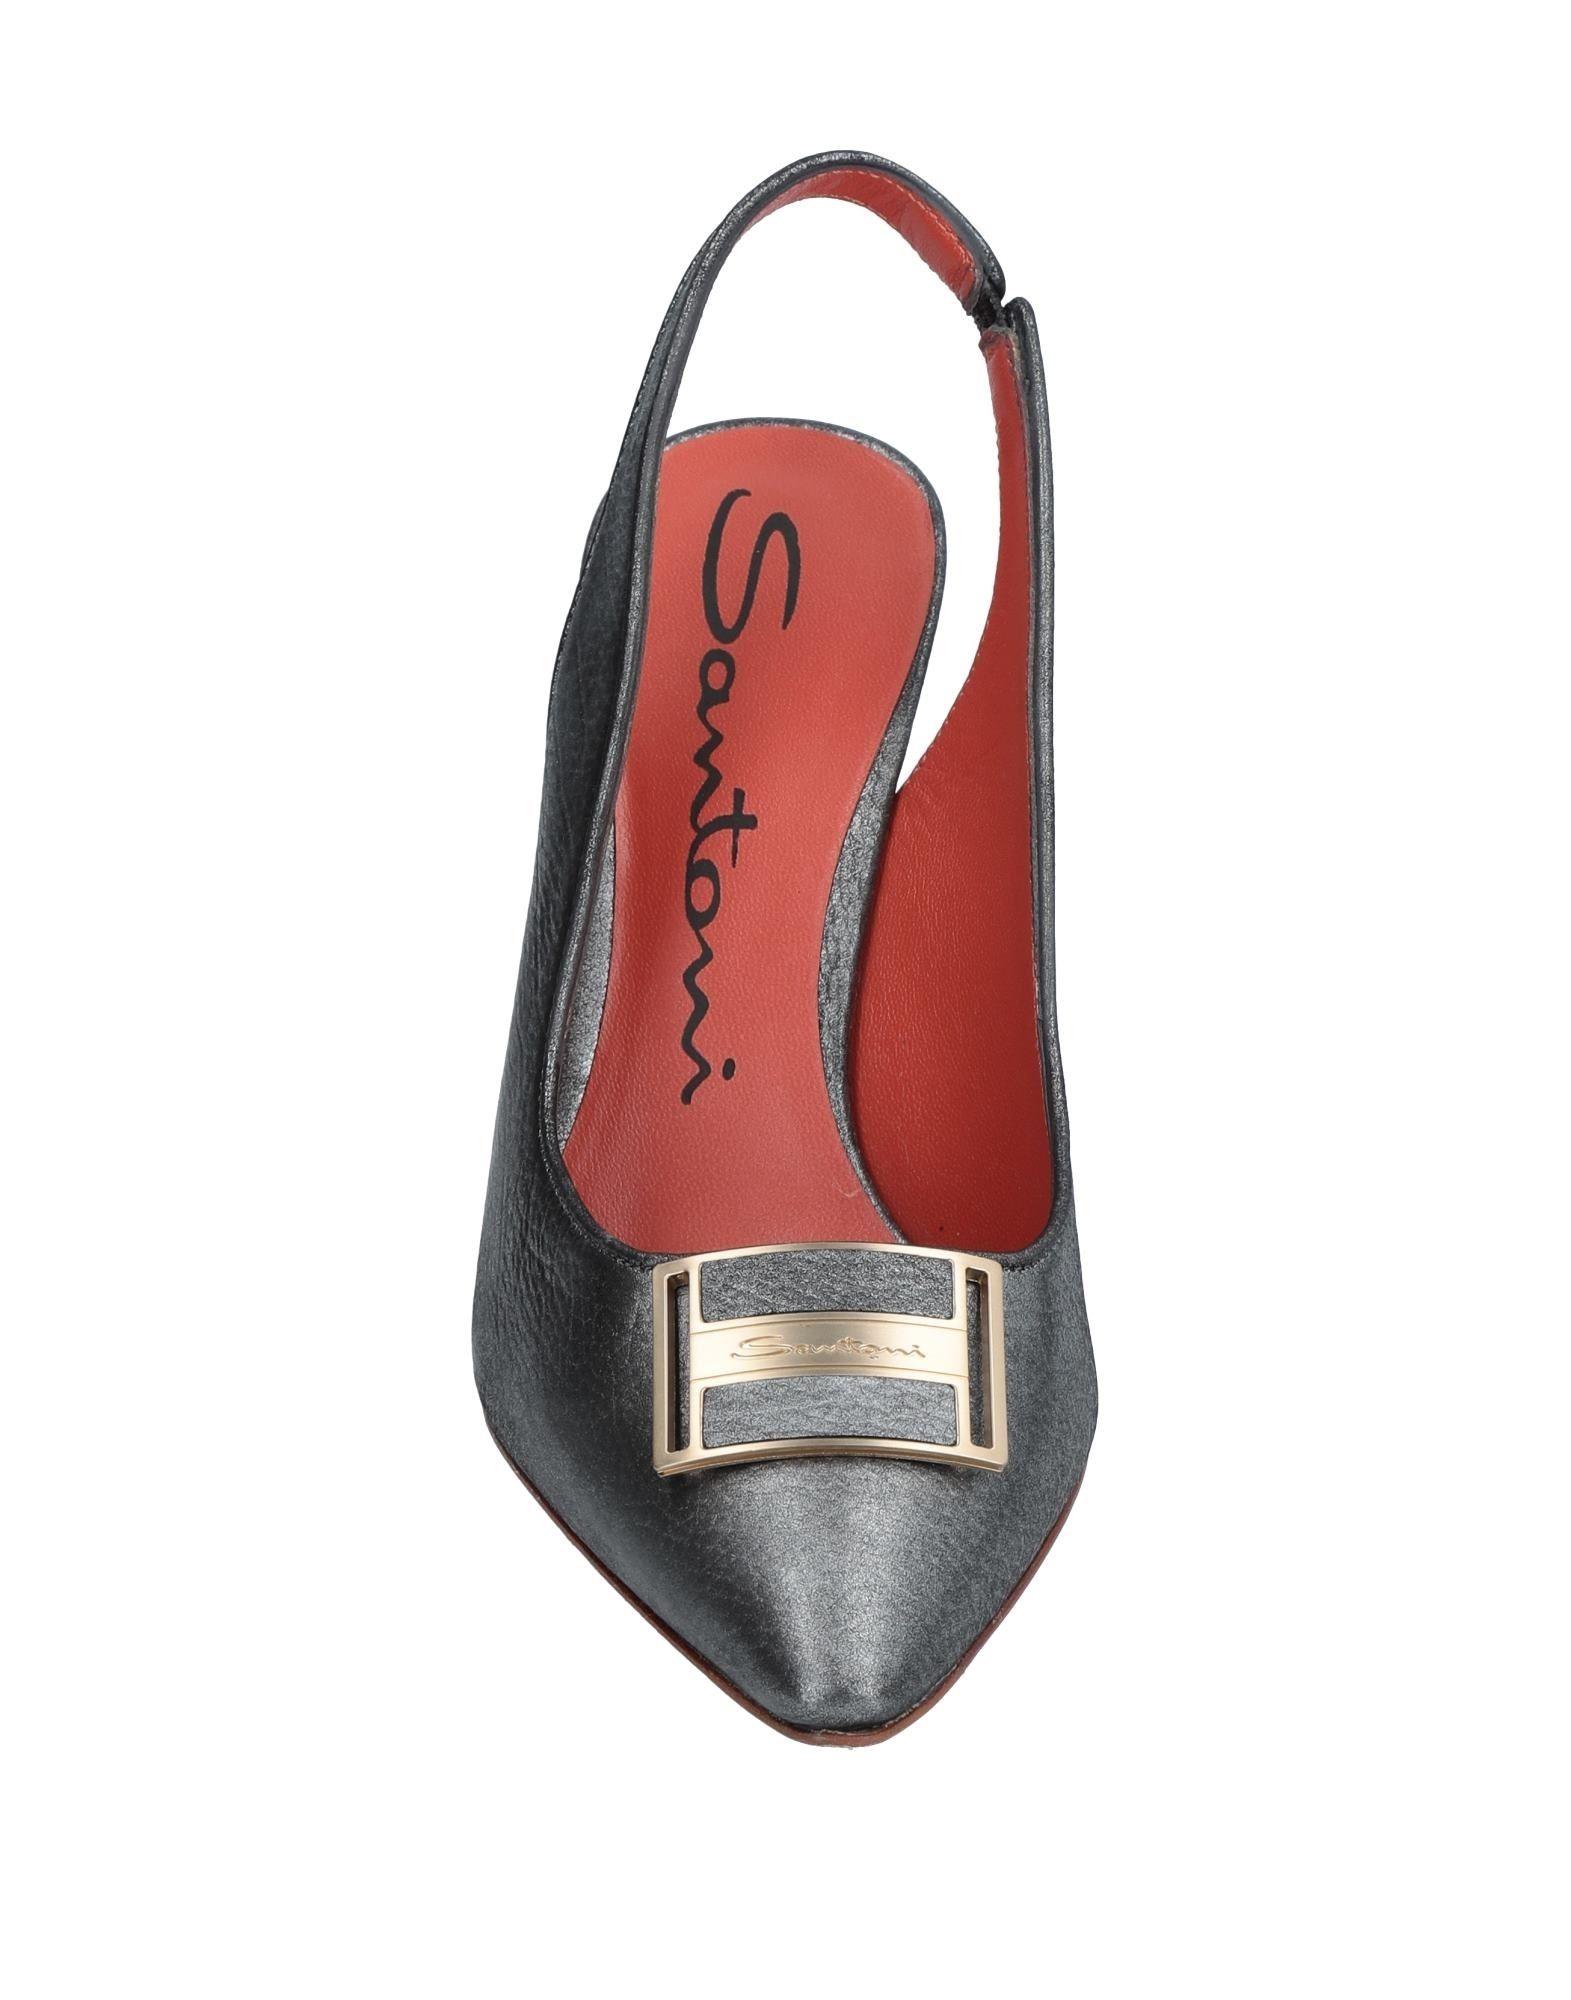 Schuhe Santoni Pumps Damen  11542262EJ Heiße Schuhe  407938